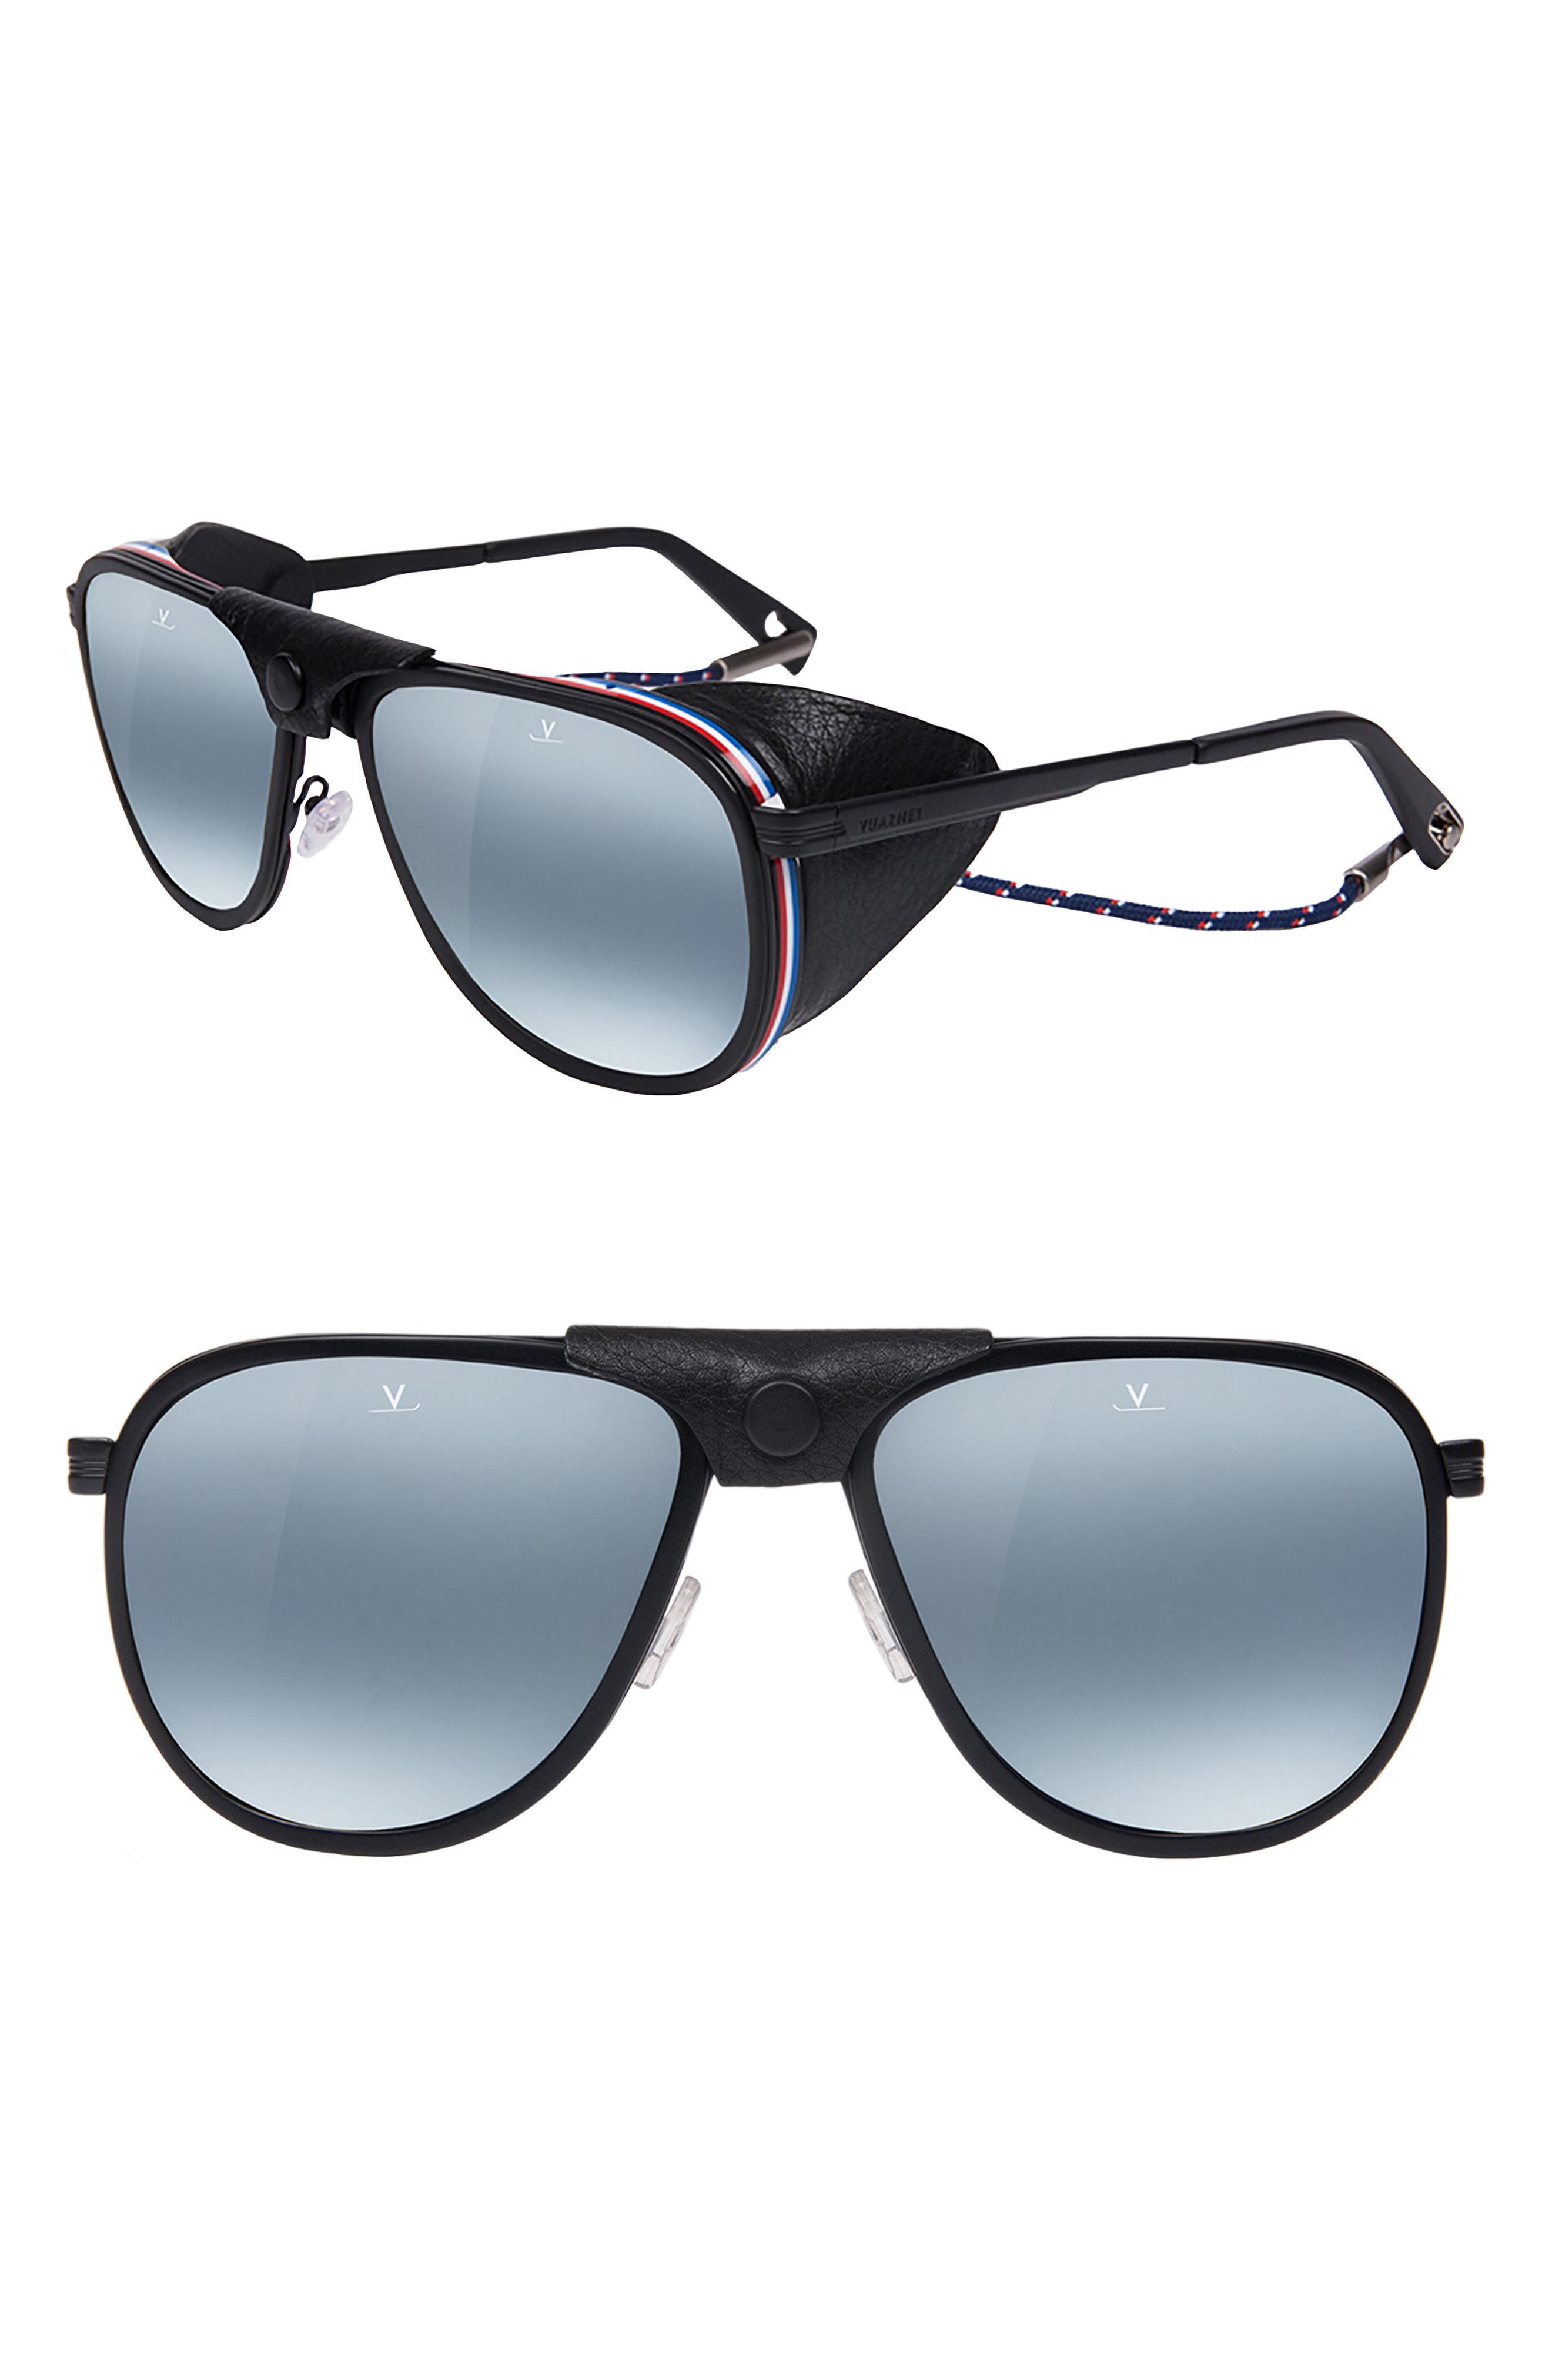 1072234733 Lyst - Vuarnet Glacier Xl 61mm Polarized Sunglasses - for Men